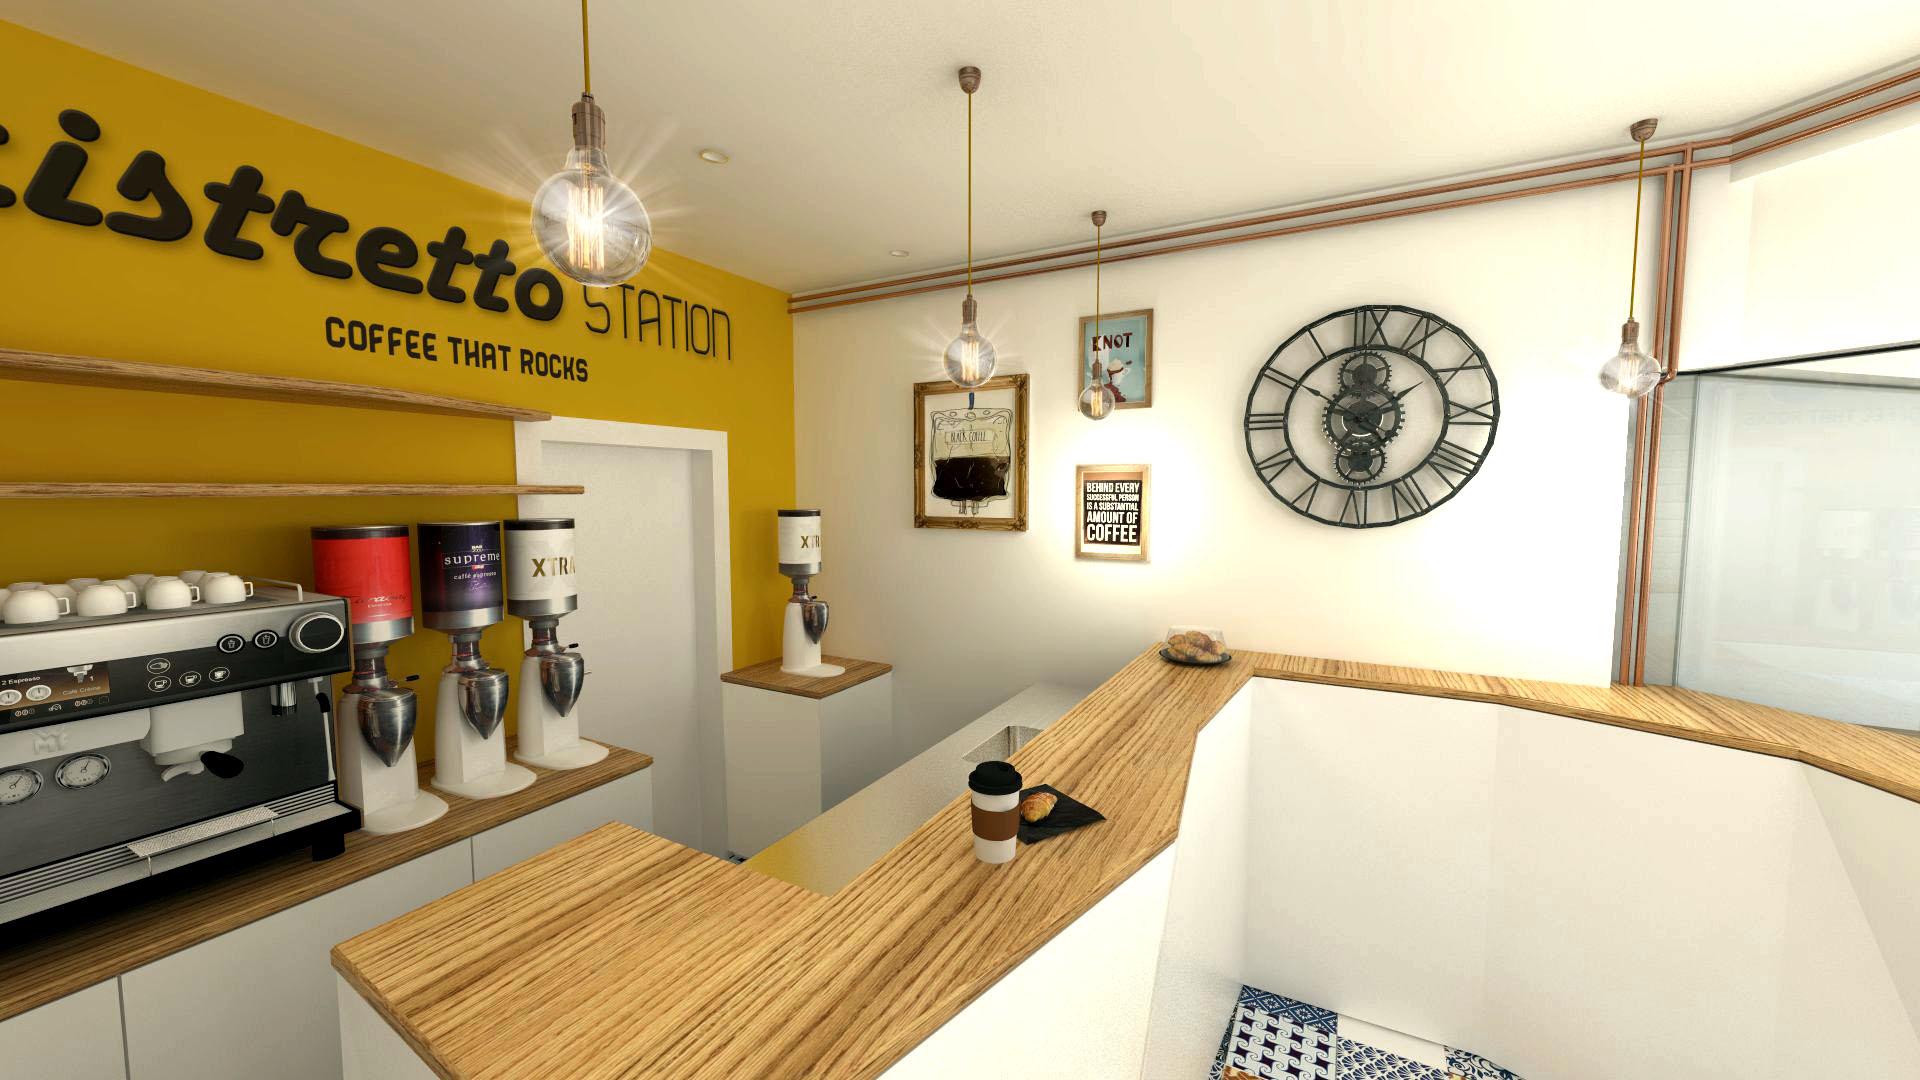 RISTRETTO STATION COFFEE SHOP 2